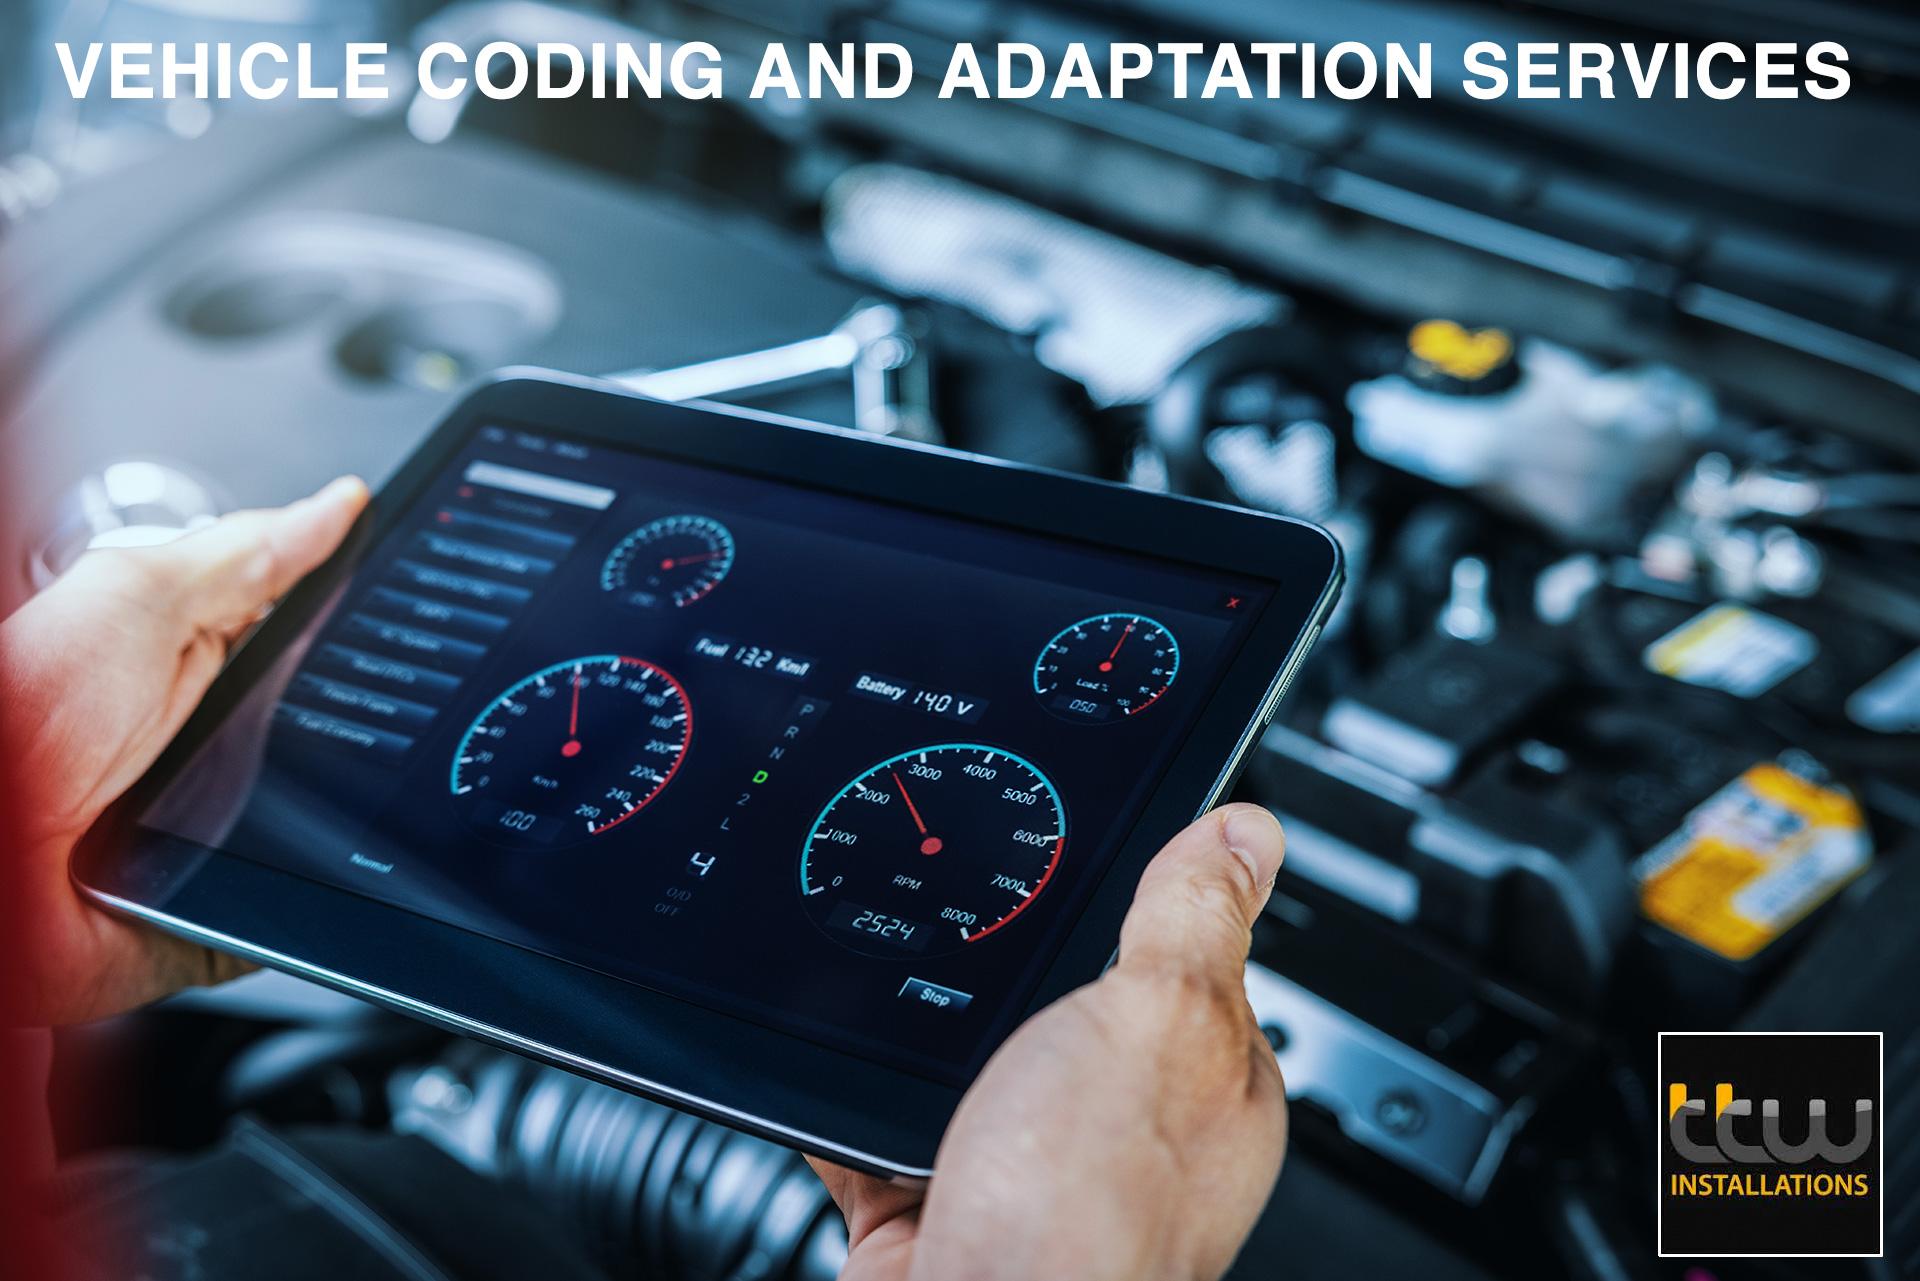 TTW – Vehicle CodingServices. VEHICLE CODING & ADAPTATION SPECIALIST SERVICES – NOTTINGHAM – EAST MIDLANDS – UK